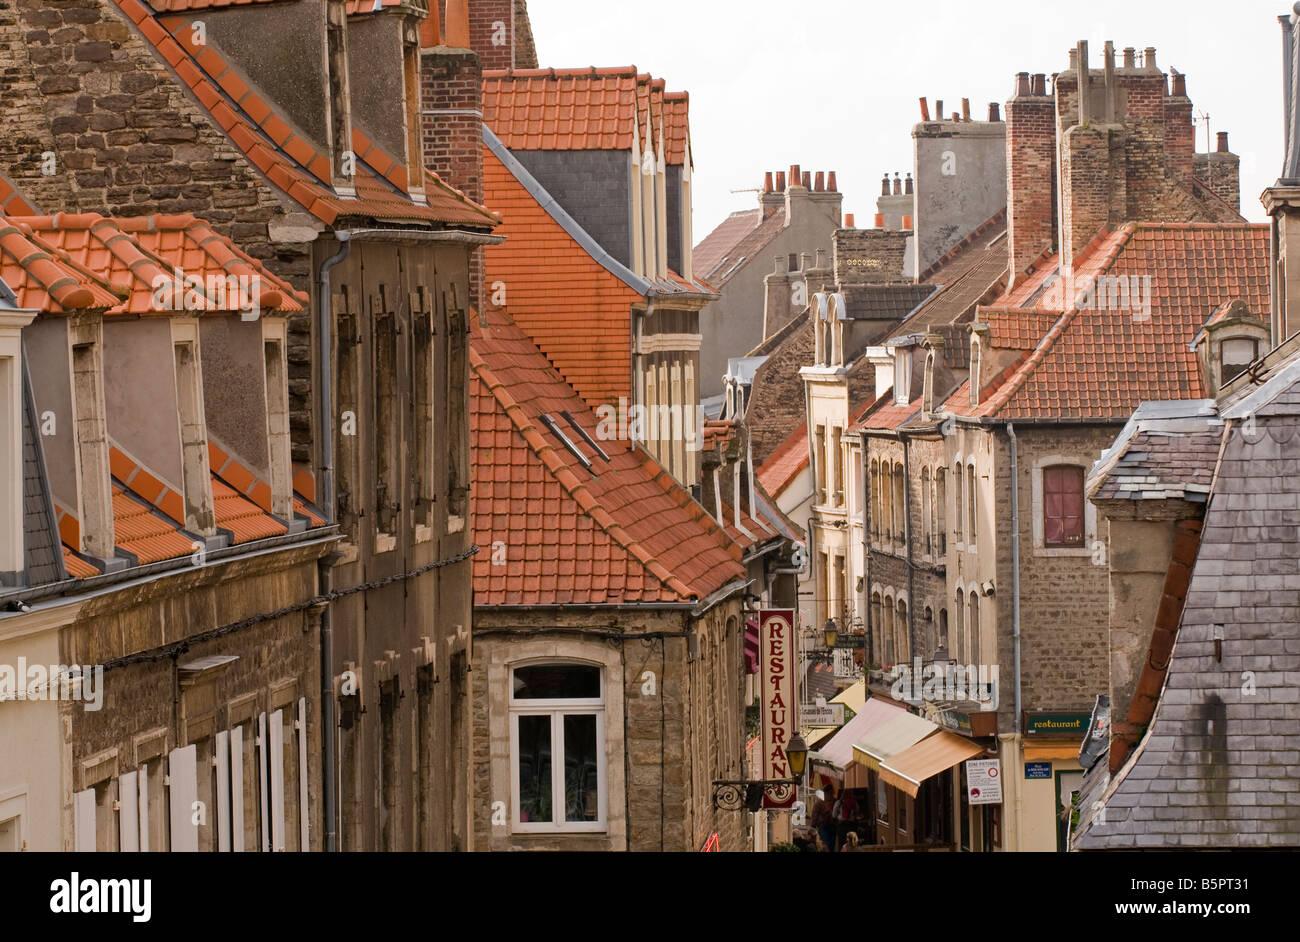 Historical French architecture of Boulogne sur Mer, Nord-Pas de Calais France - Stock Image